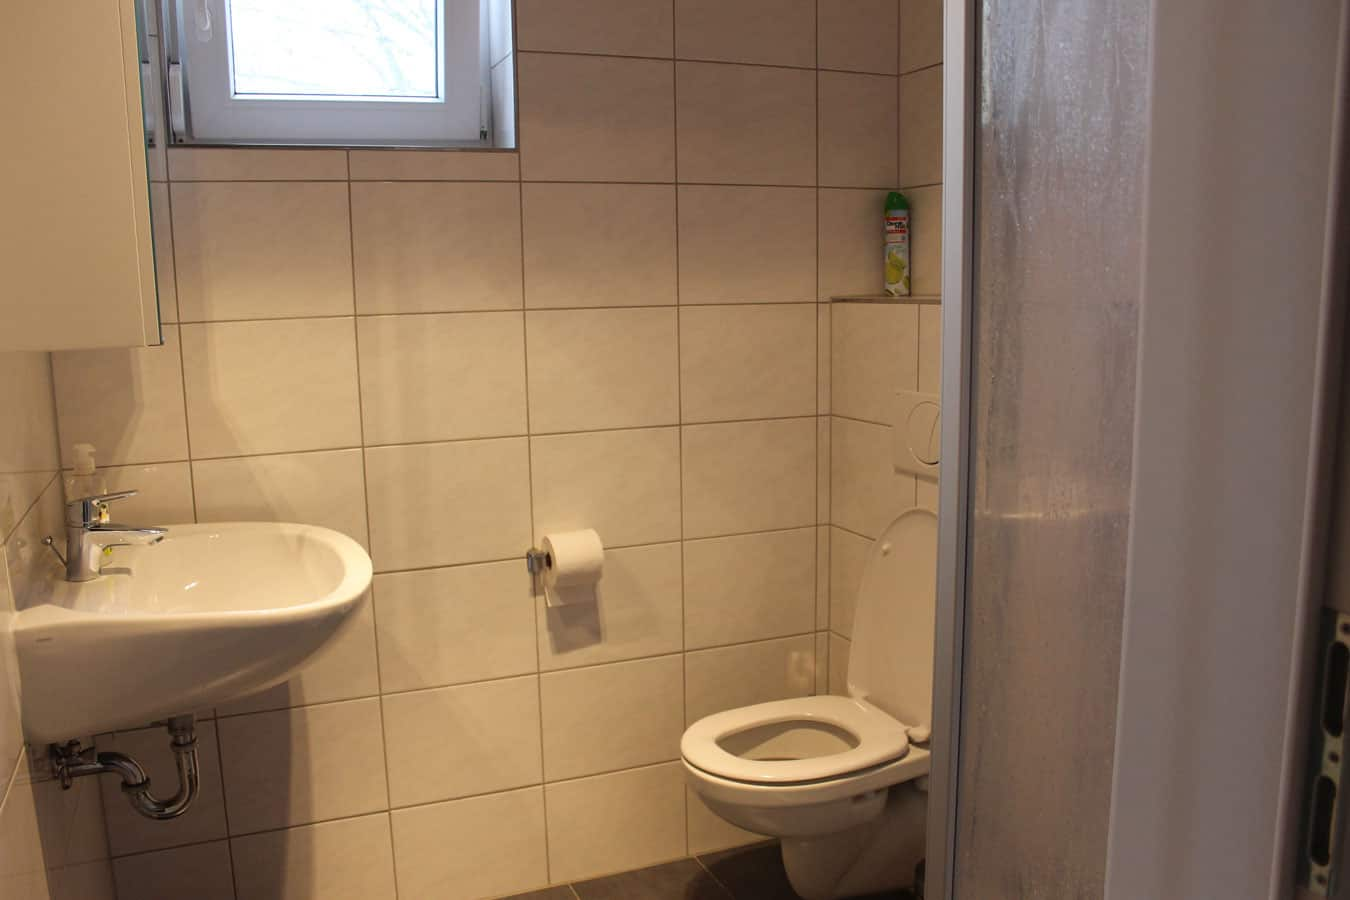 villa-wulp-impressie-1-badkamer-2-kwo-villa